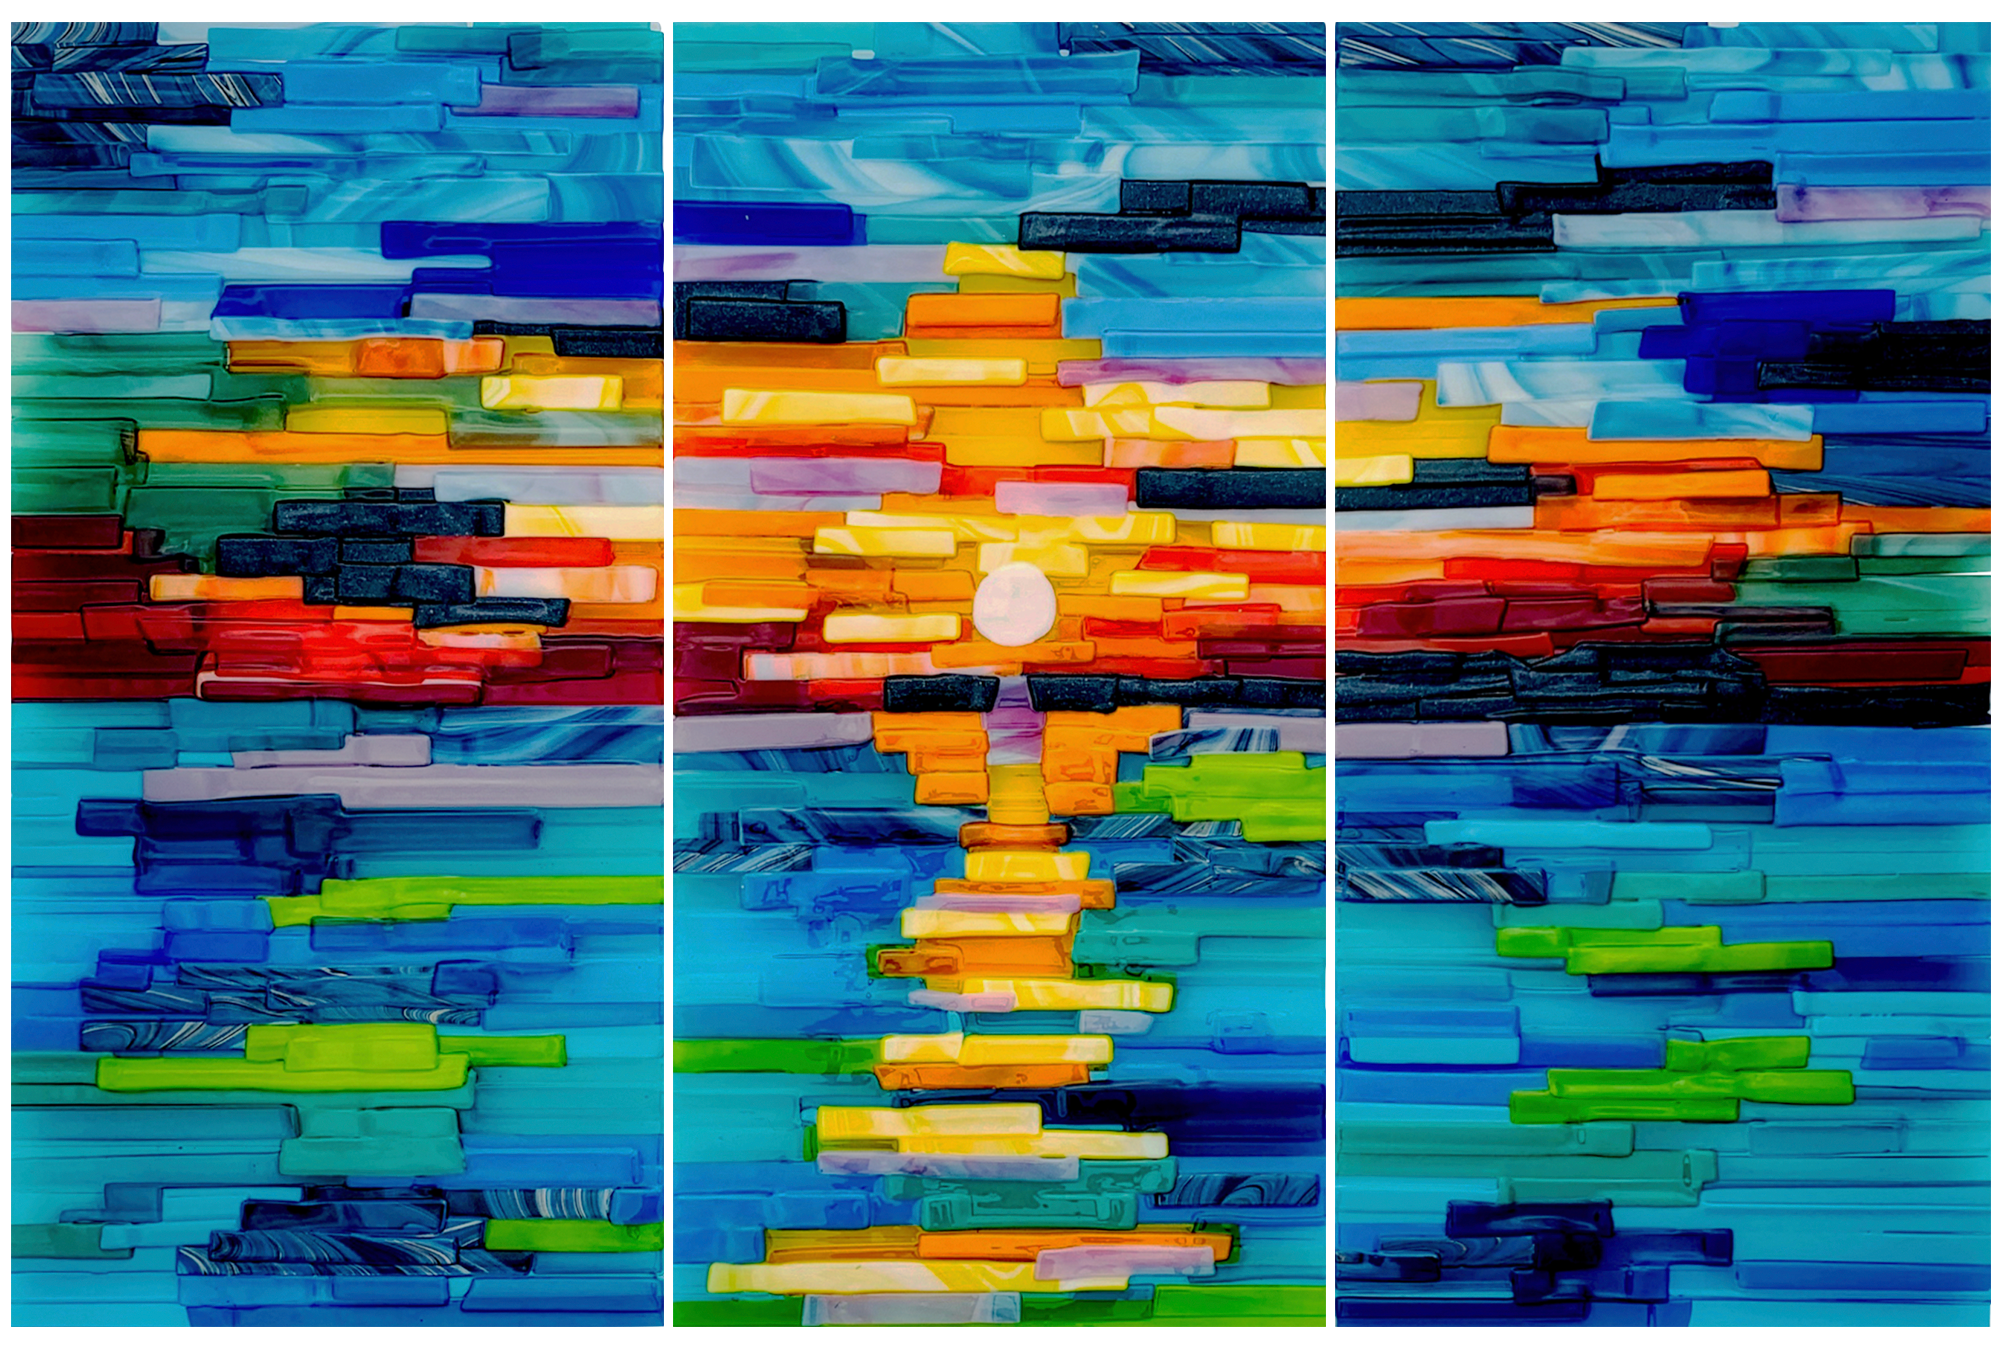 Thunderbird sunset trip 2.lowres gcnekd